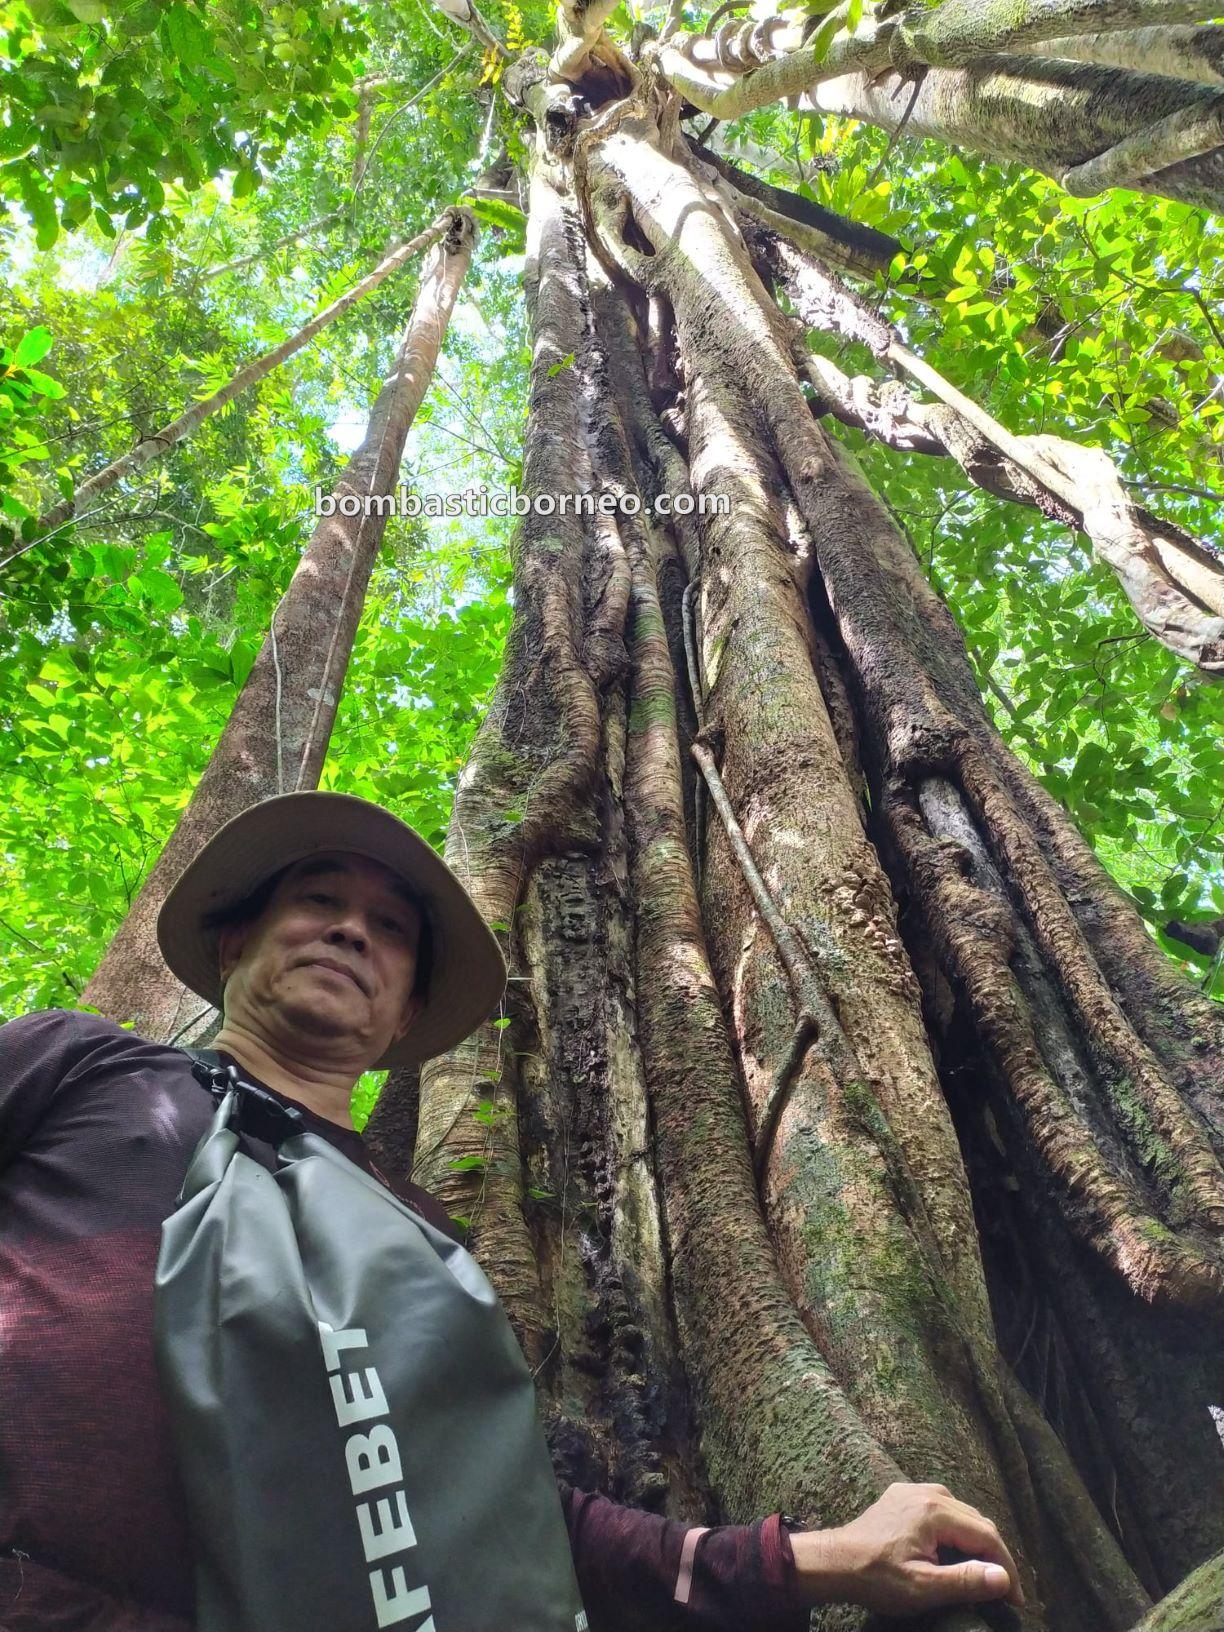 Bung Mawang, Kampung Serumah, Kampung Gayu, rainforest, adventure, nature, outdoor, jungle trekking, hiking, Kuching, Sarawak, Malaysia, tourist attraction, travel guide, Borneo,